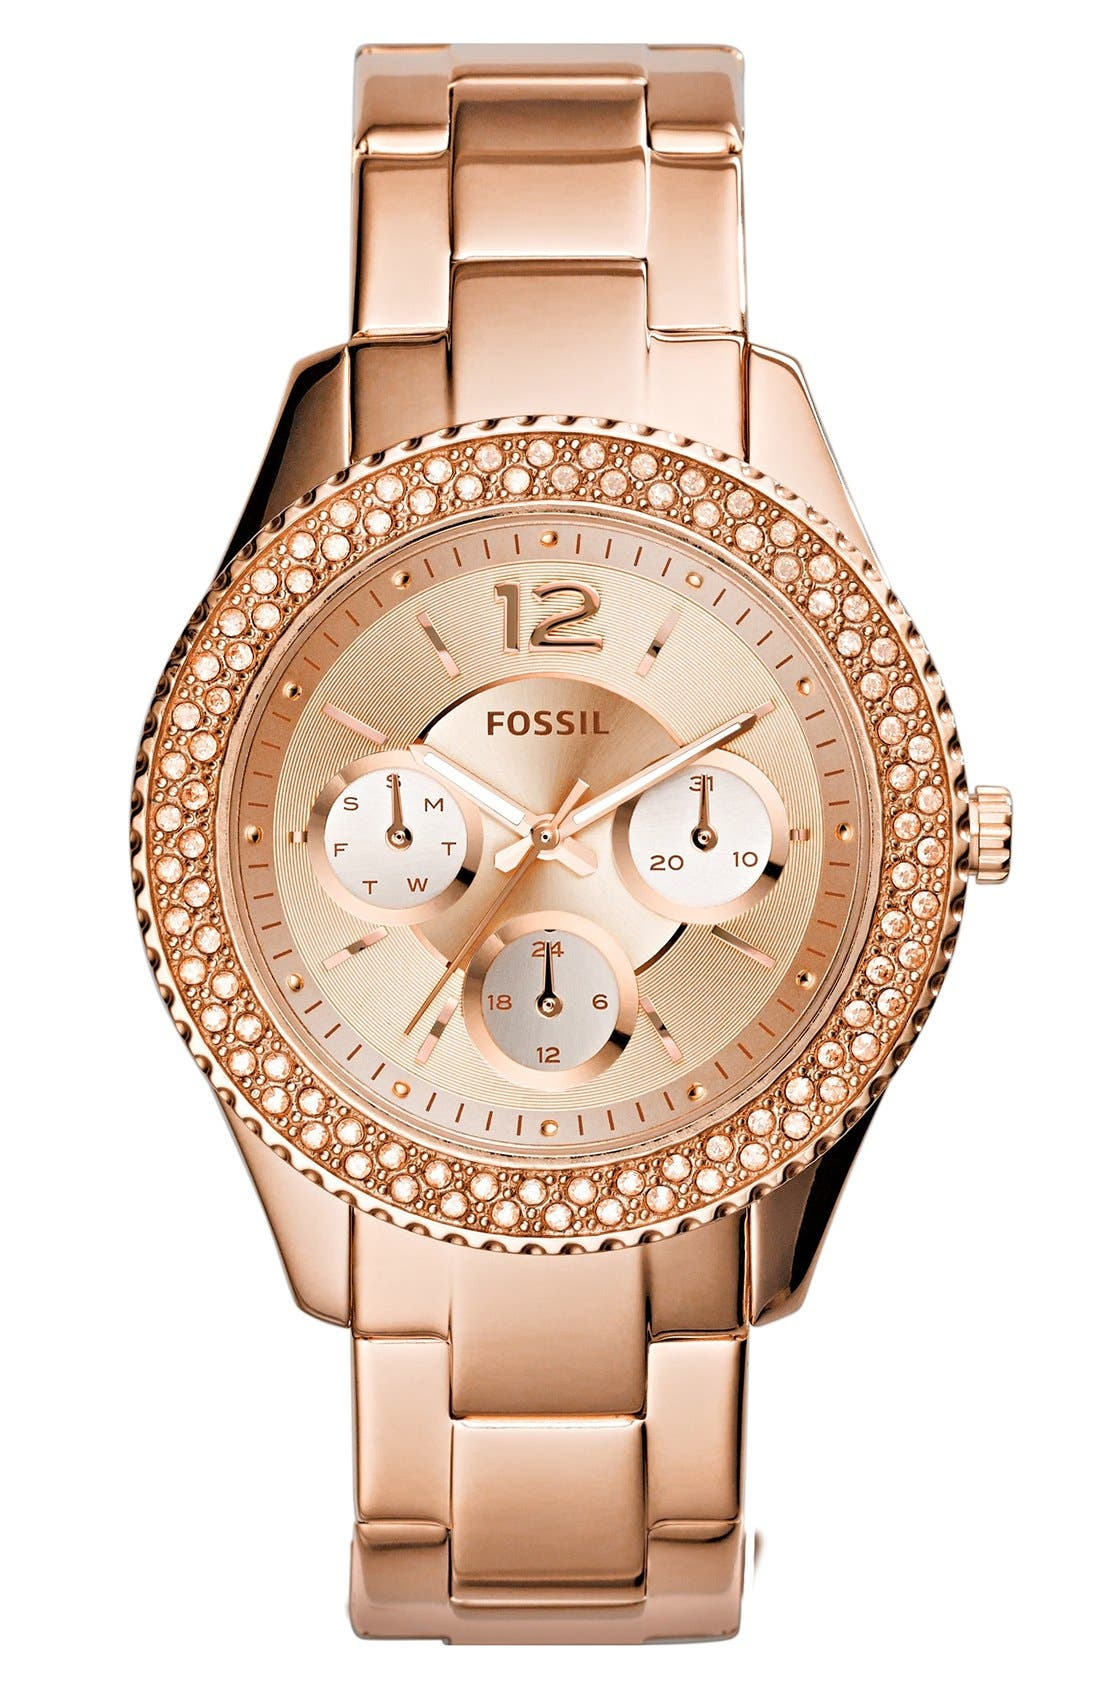 FOSSIL, 'Stella' Crystal Bezel Multifunction Bracelet Watch, 38mm, Main thumbnail 1, color, ROSE GOLD